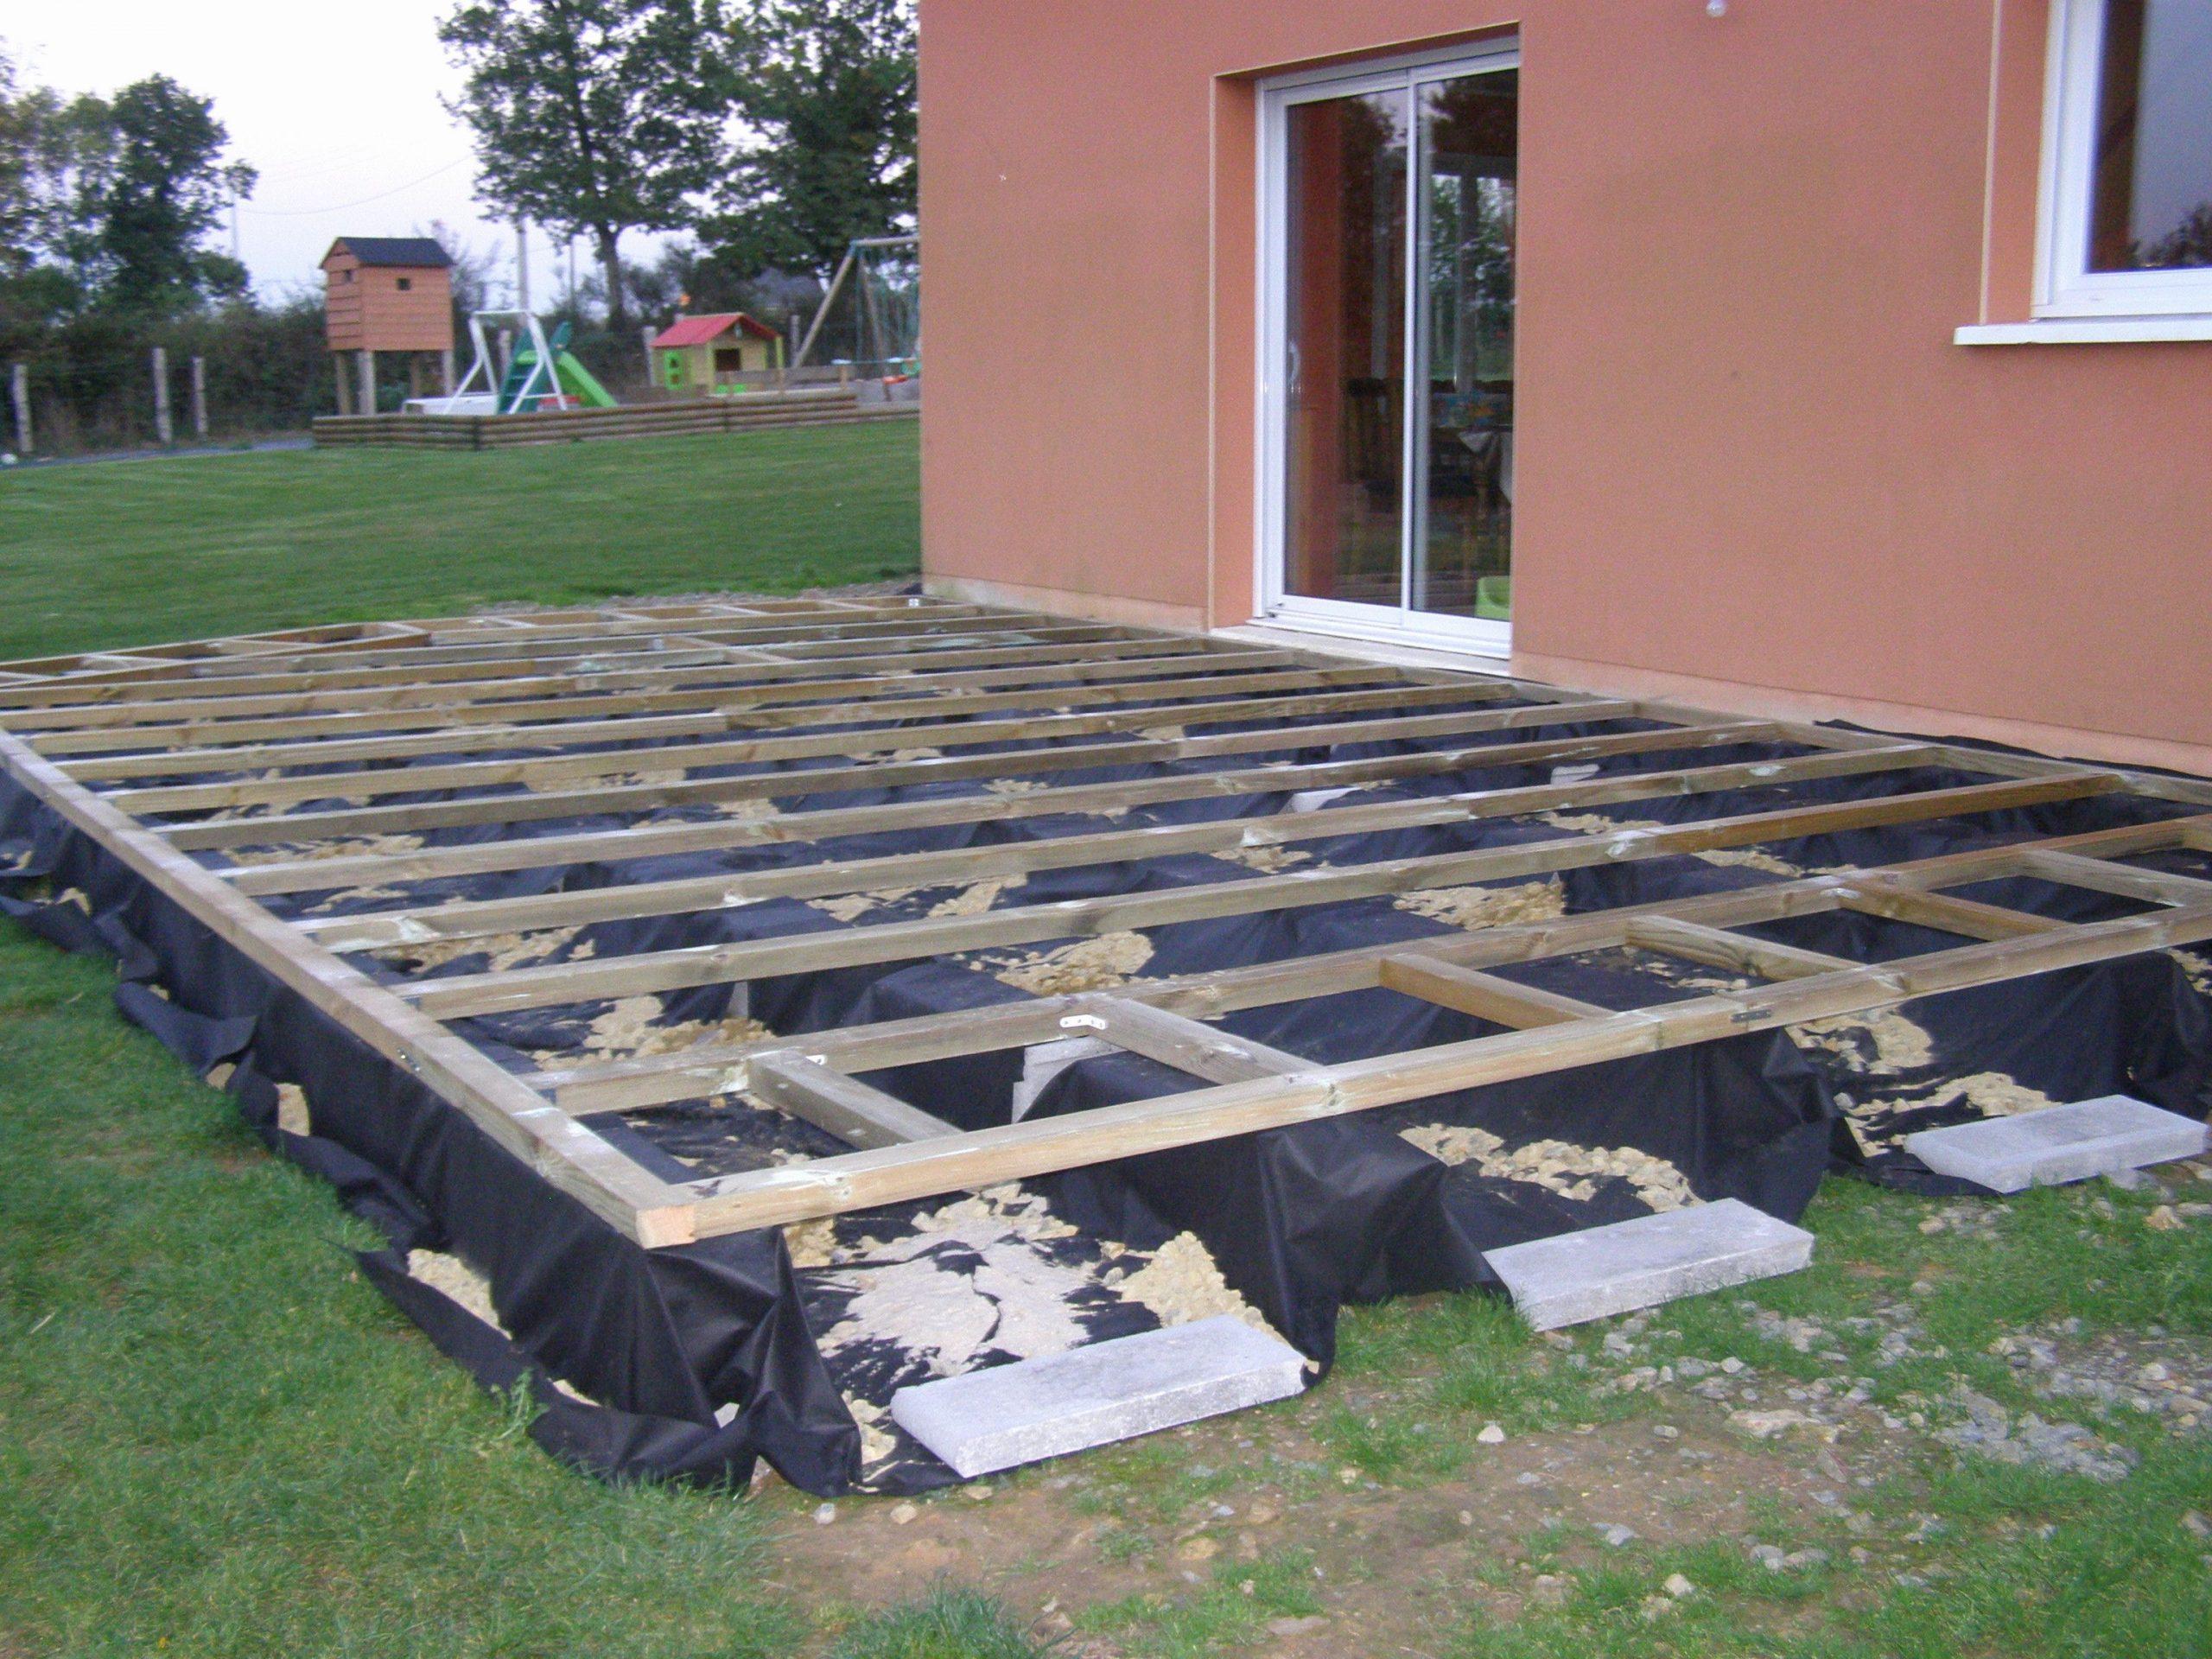 Lovely Vis Pour Terrasse Bois Leroy Merlin Pose Terrasse Avec Plot Terrasse Bois Leroy Merlin Idees Conception Jardin